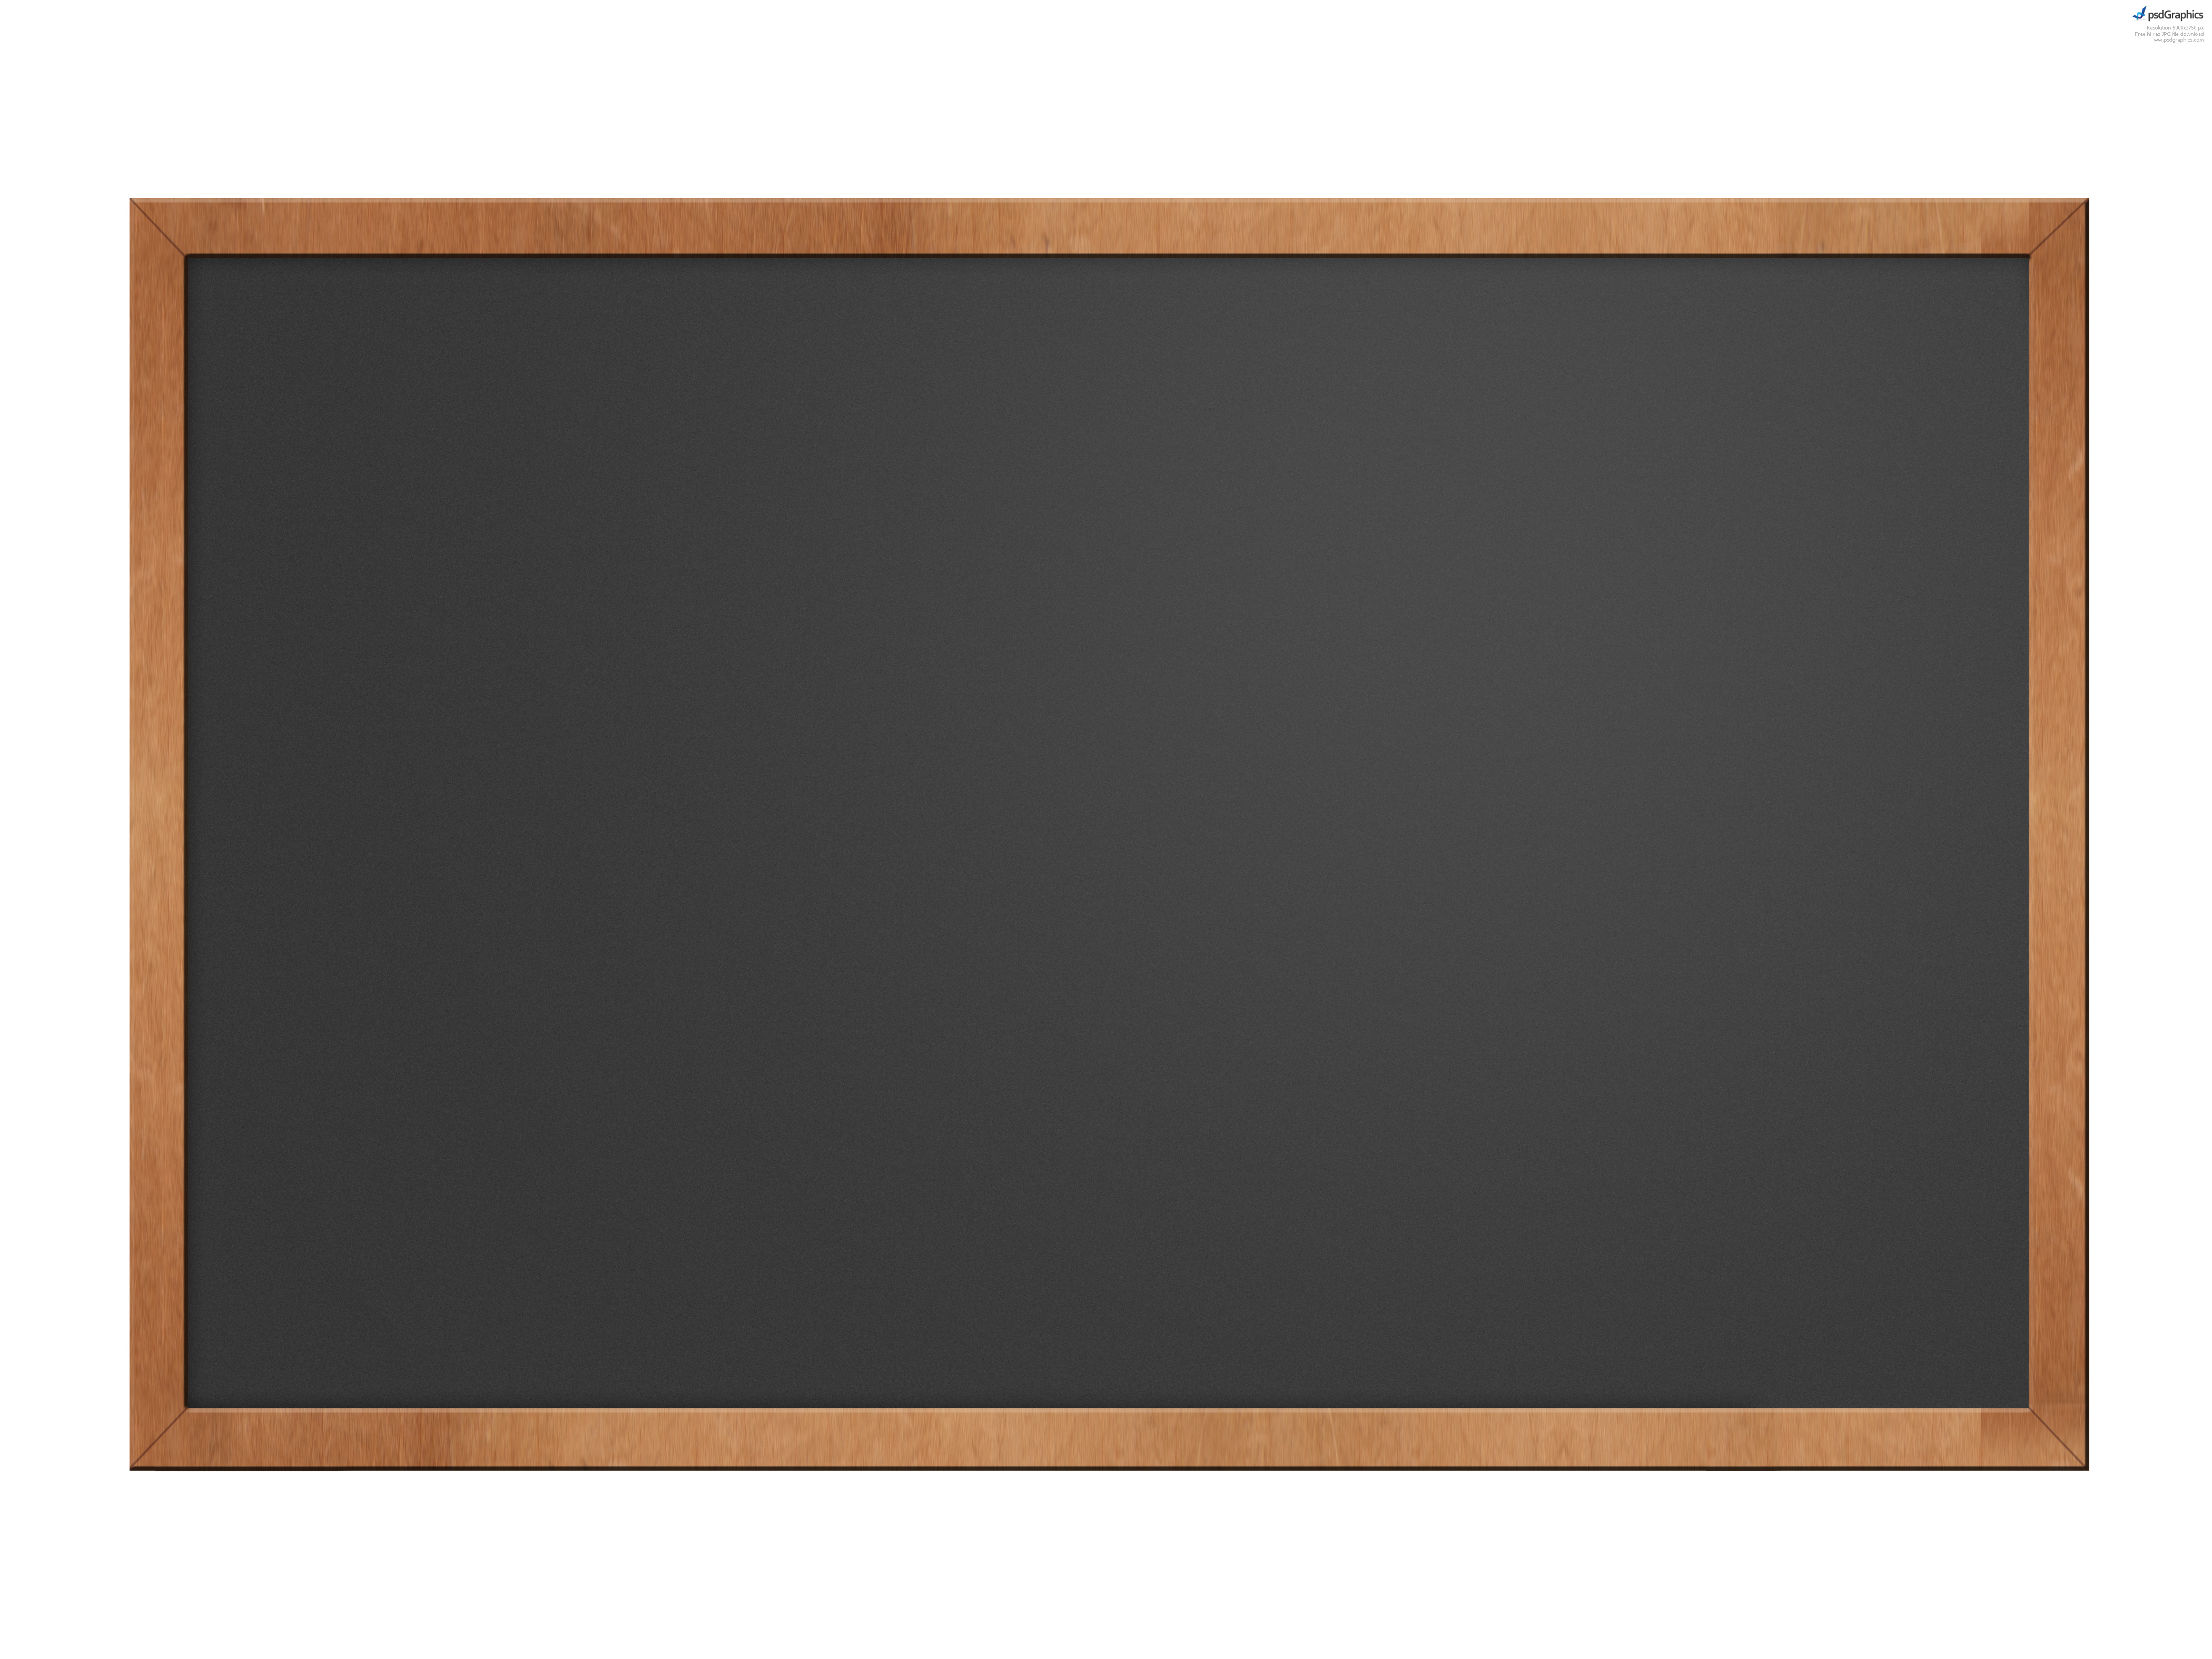 Chalkboard Background Clipart - Clipart Kid